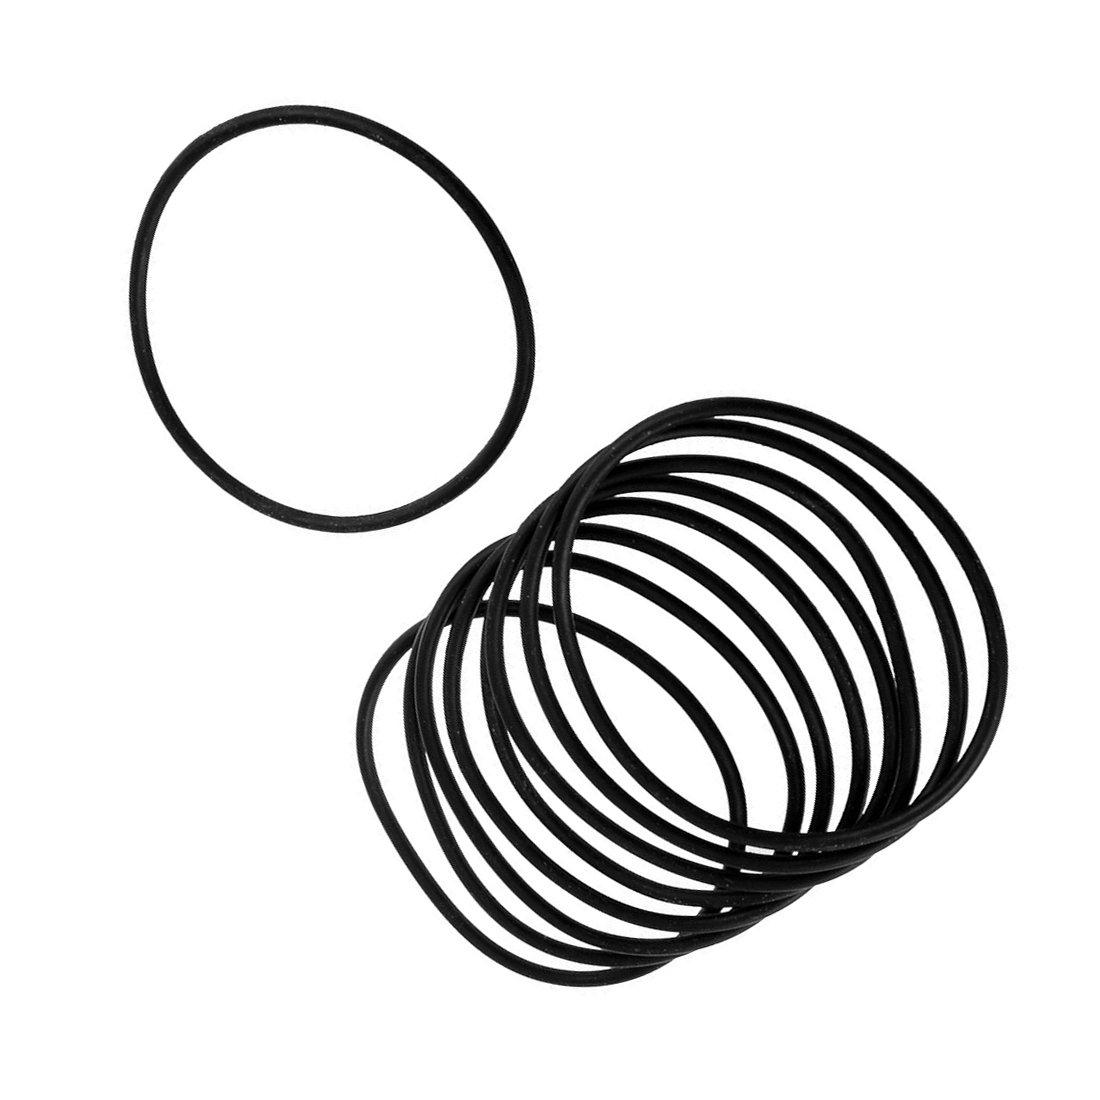 R 10 PCS Schwarz Gummi Oil Seal O-Ring Dichtung Unterlegscheiben 75x3x69mm O-Ring Dichtung Unterlegscheiben TOOGOO